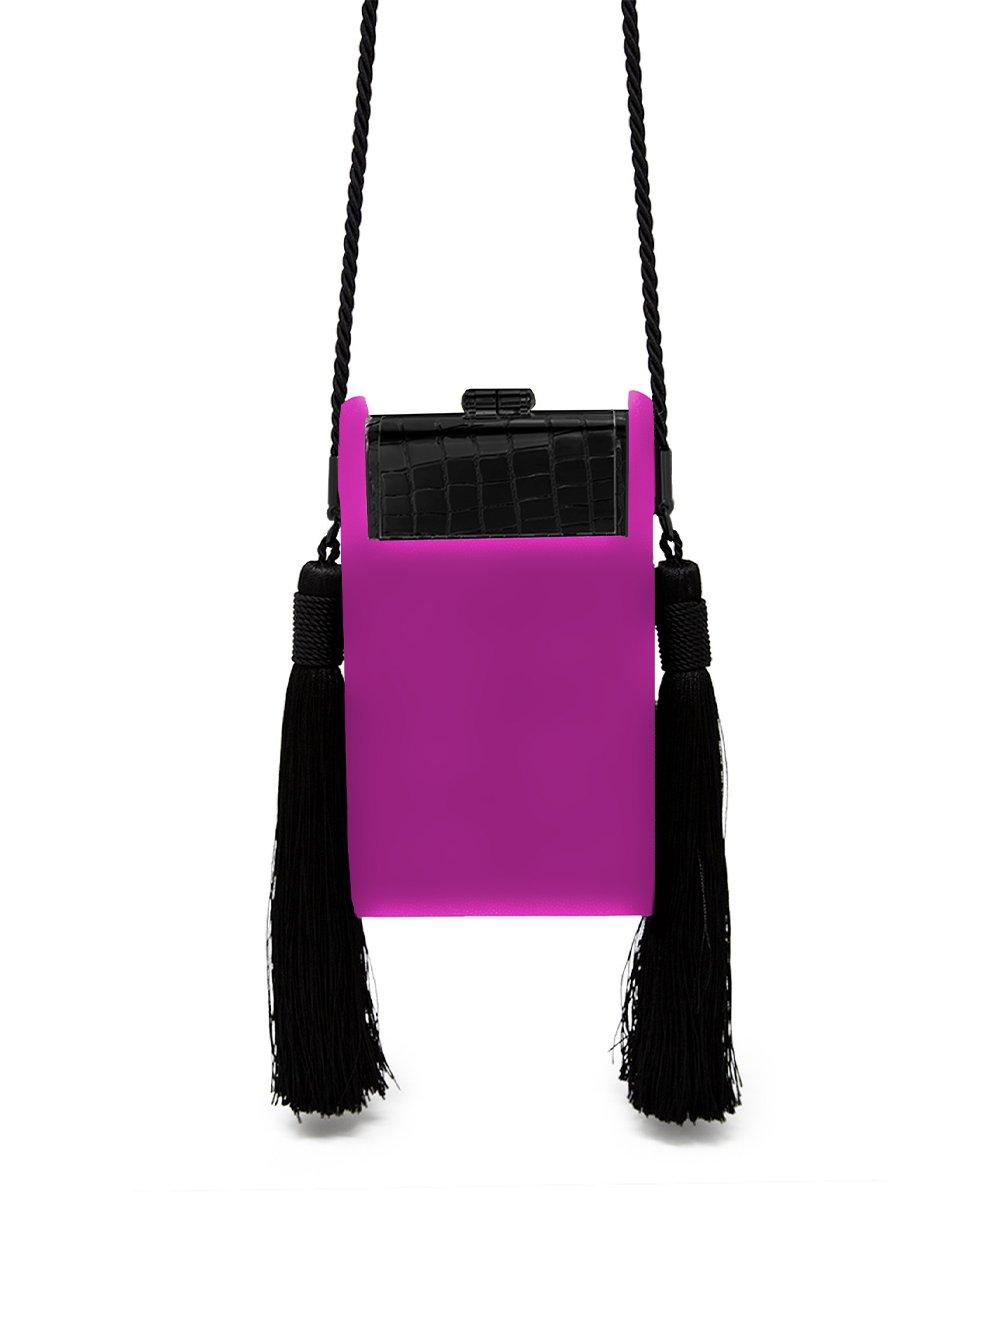 Bienen Davis Women's Crossbody Palladium Small Satin Gunmetal Phone Bag in Fuchsia